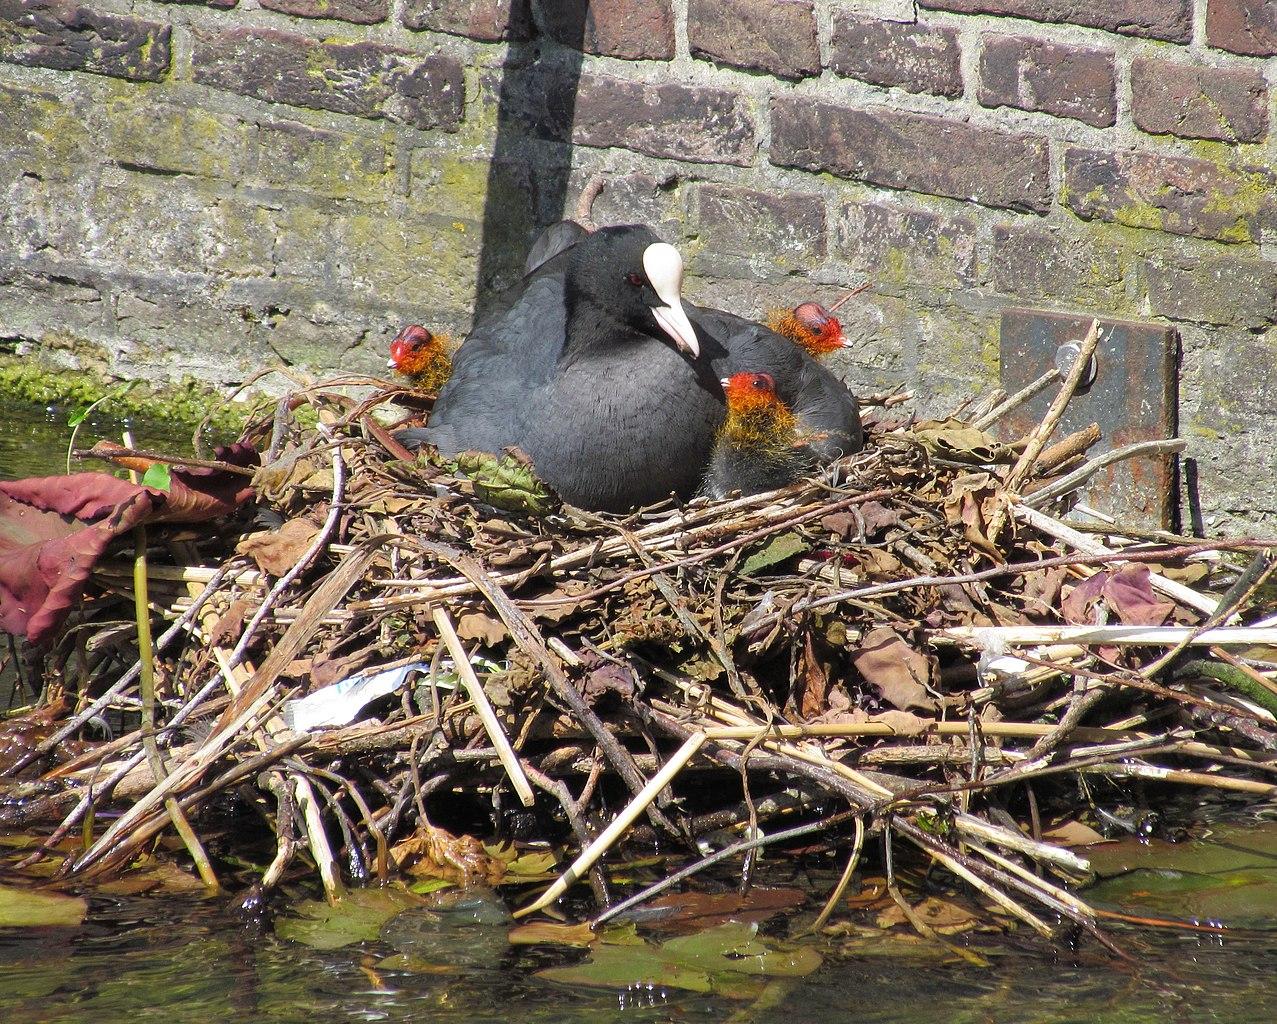 Coot with chicks, Hofvijver, the Hague, 30 May 2011